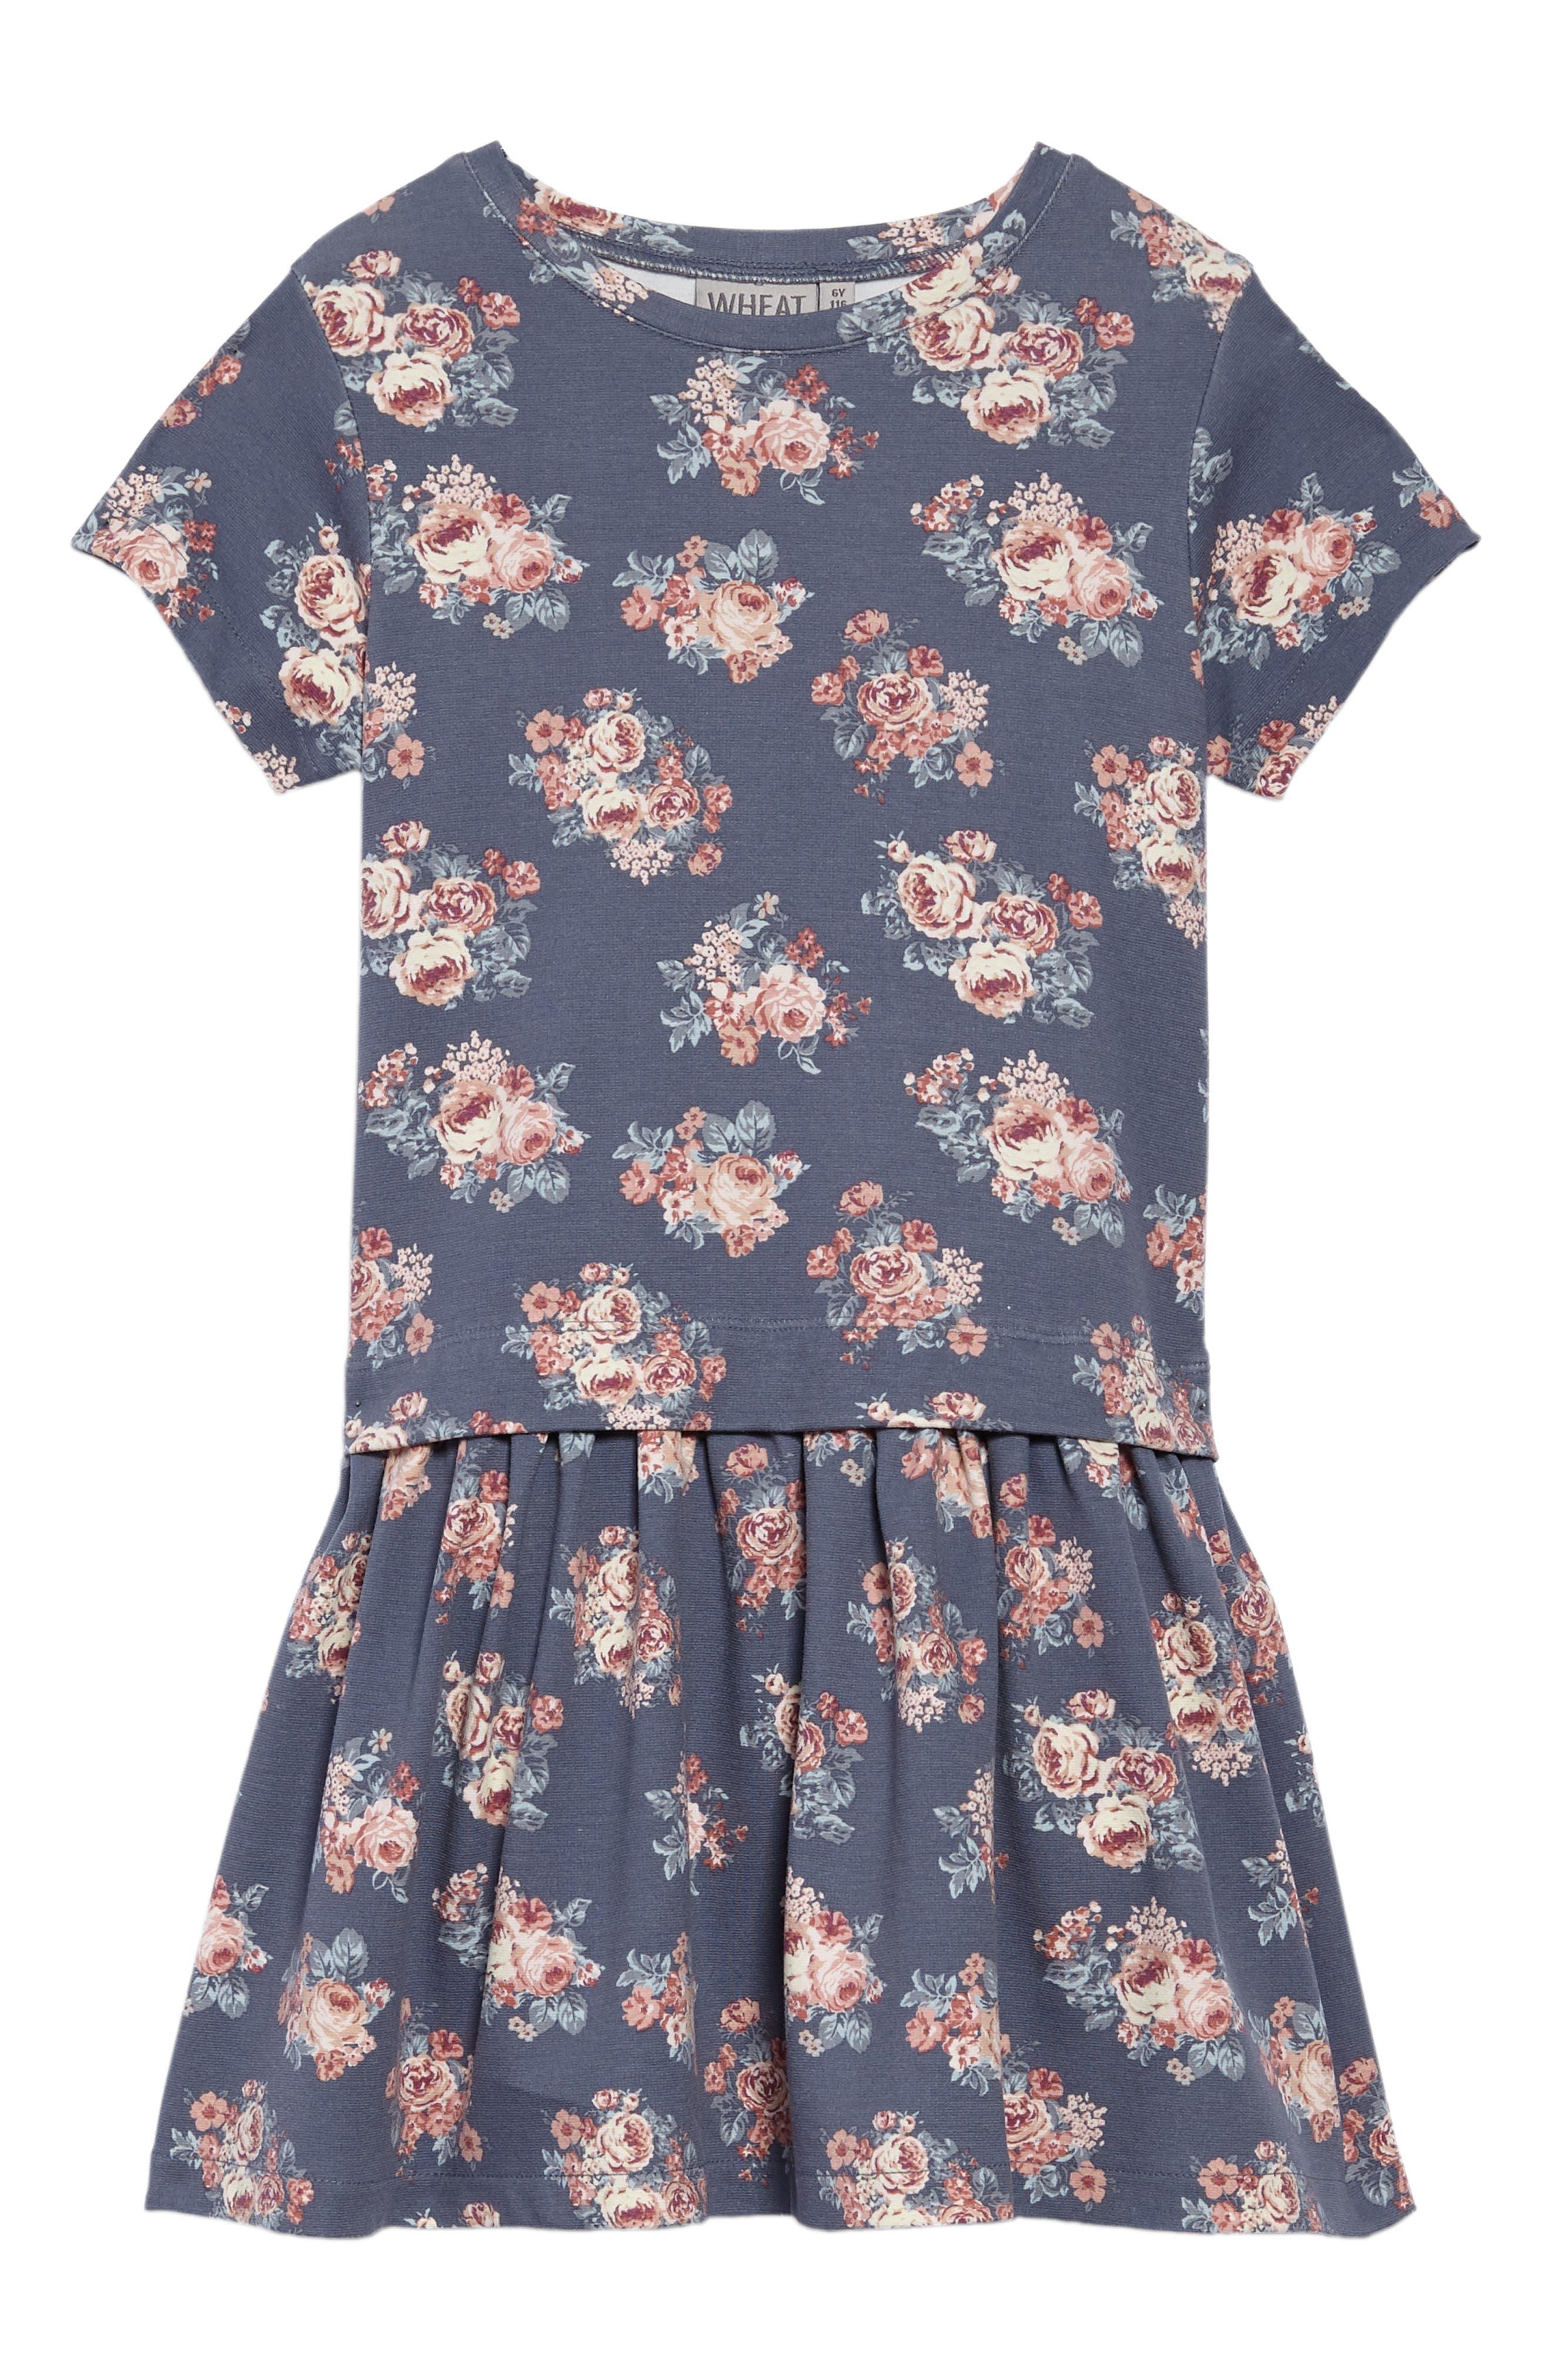 Michella Floral Print Dress,                             Main thumbnail 1, color,                             Grisaille